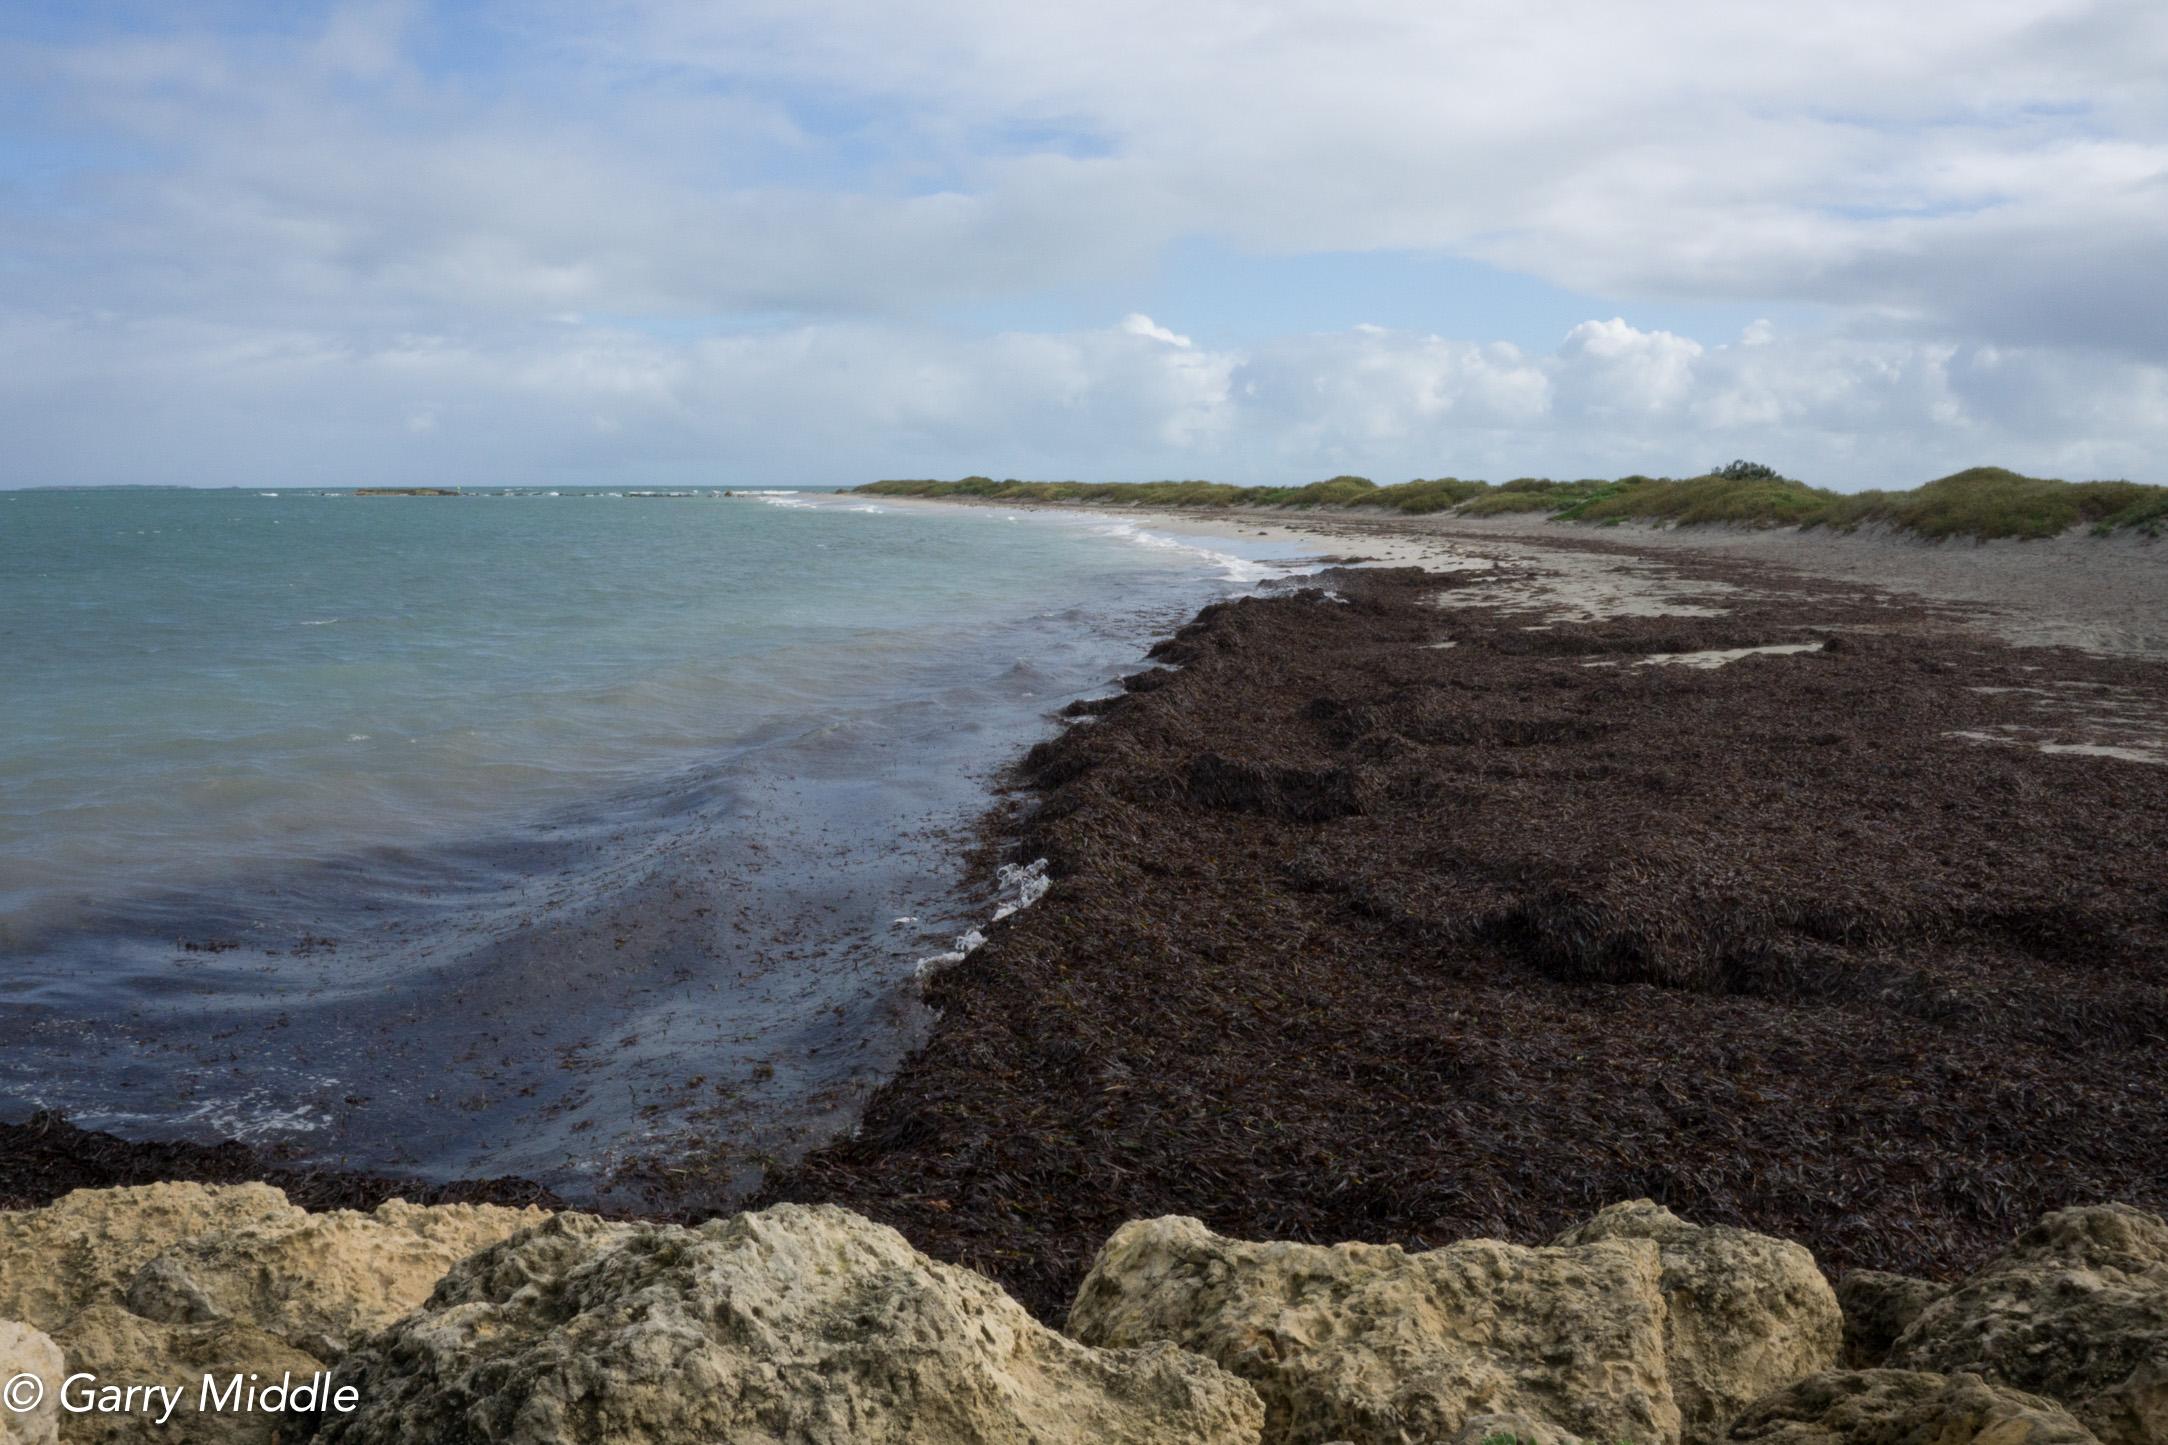 Plate 9: Beach walk to Woodman Point.